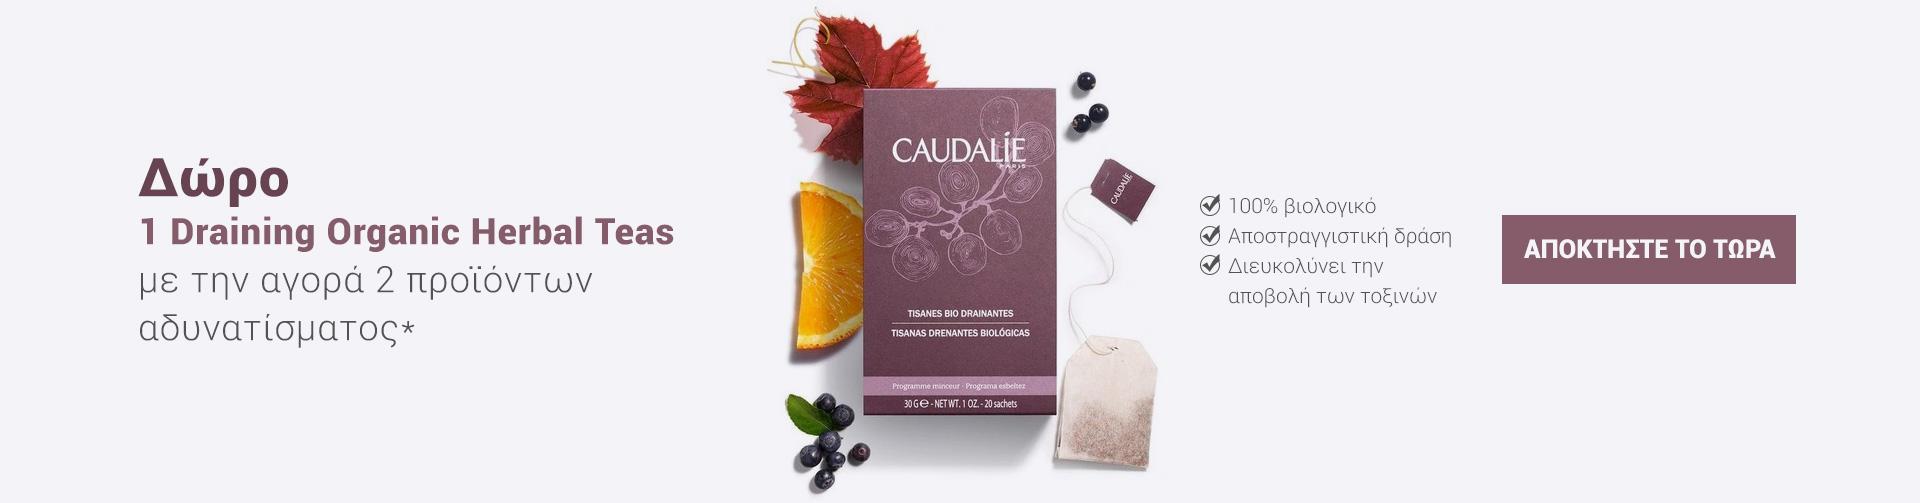 Caudalie Δώρο Τσάι Αποτοξίνωσης